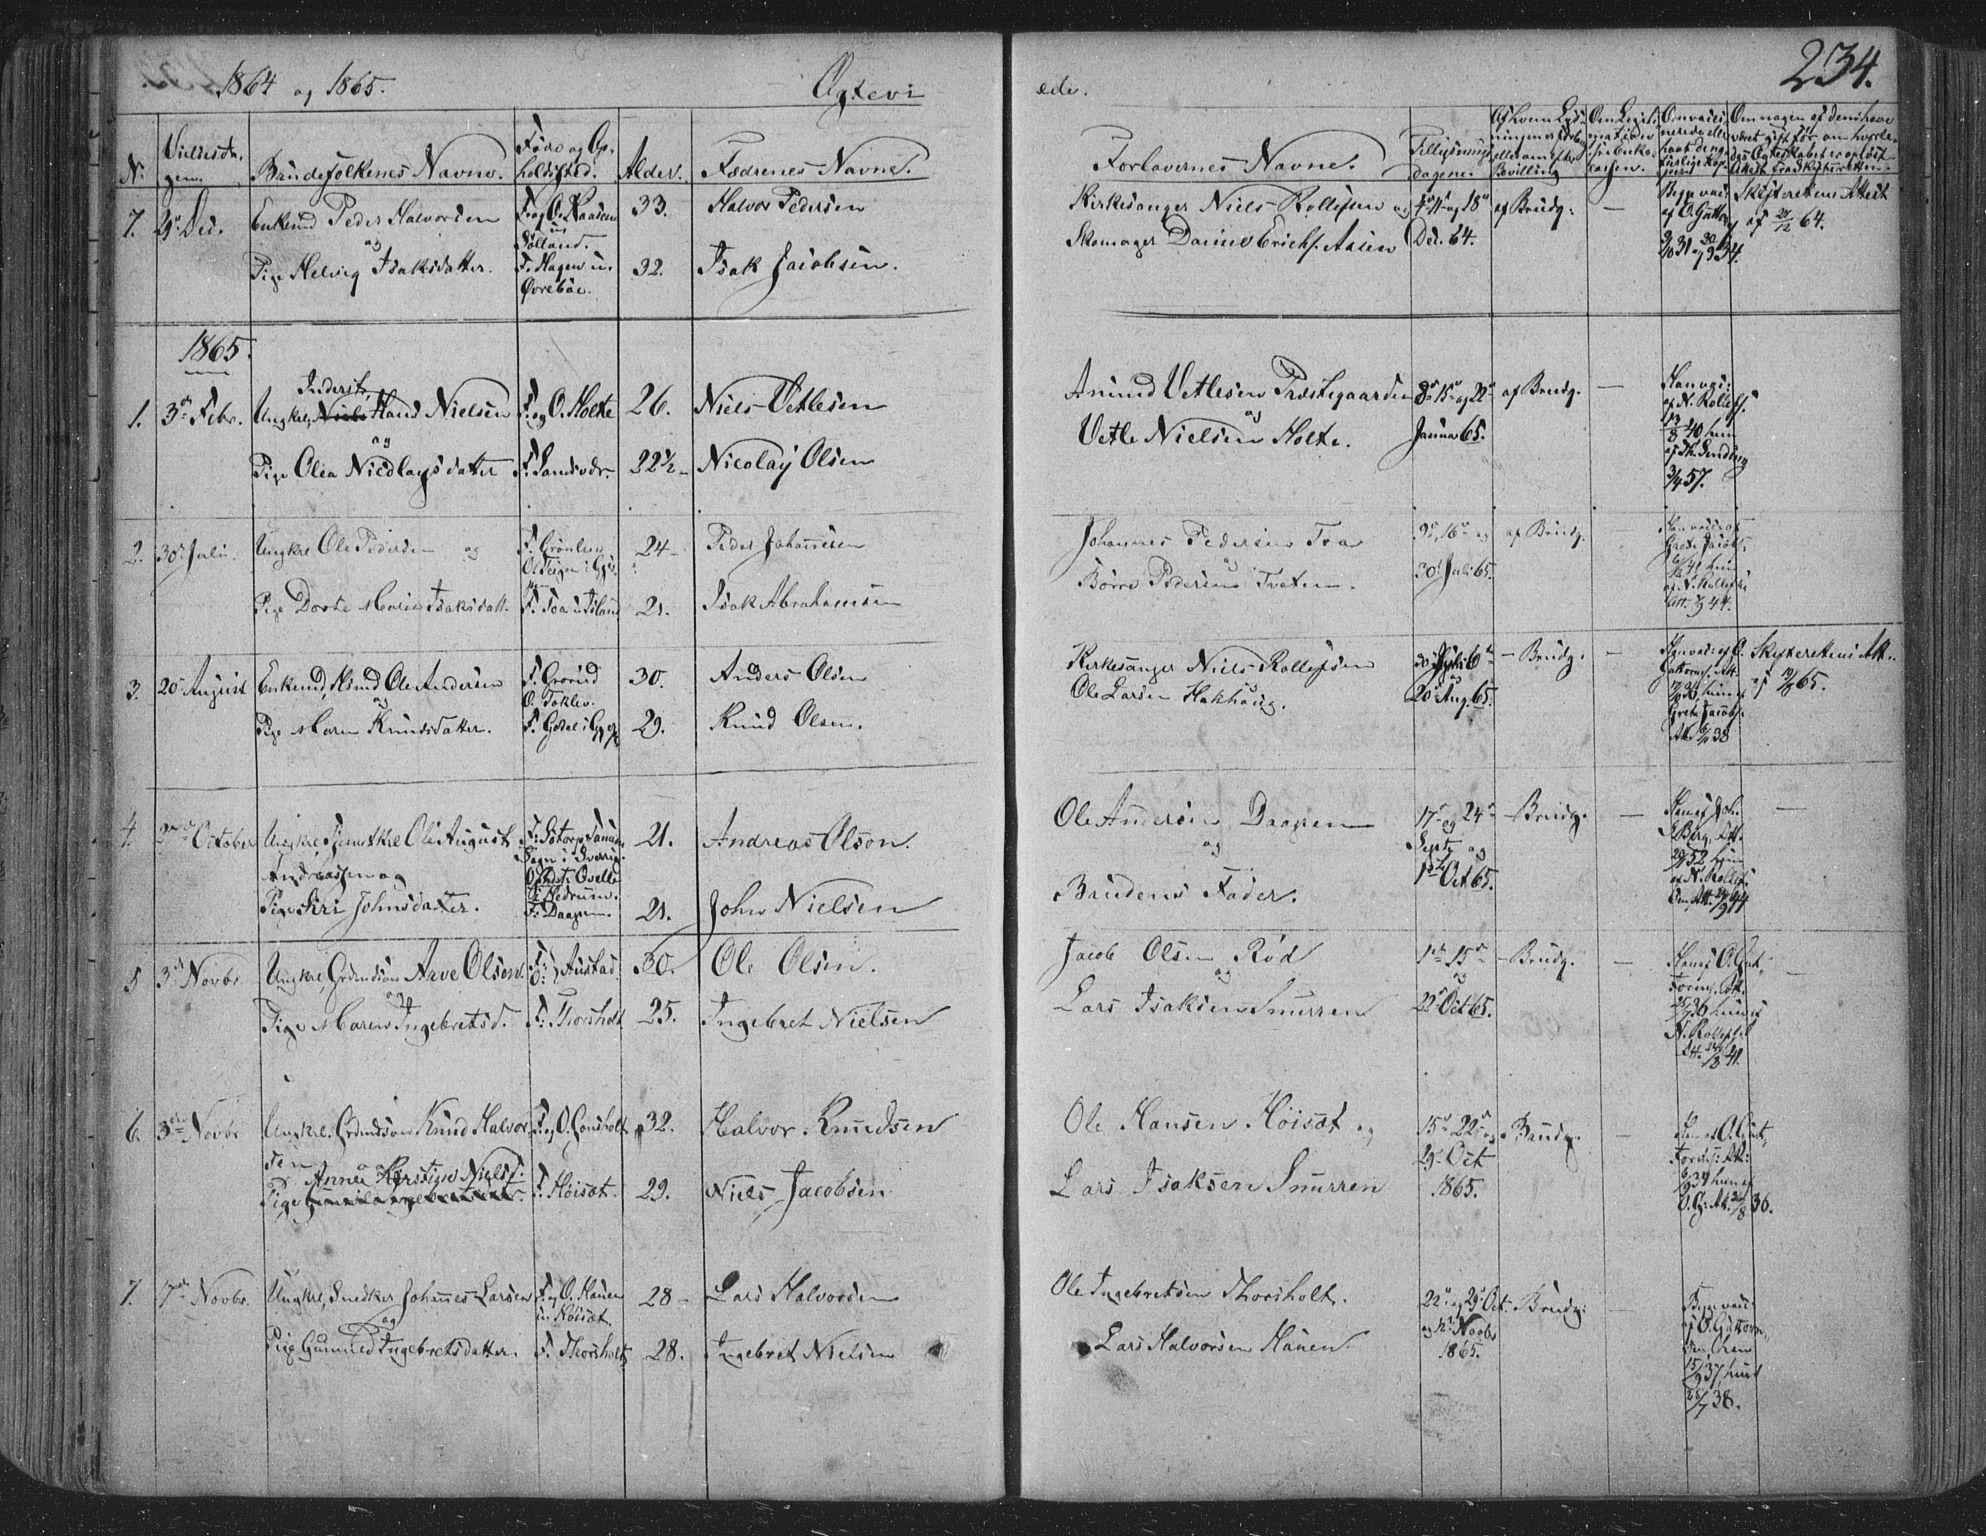 SAKO, Siljan kirkebøker, F/Fa/L0001: Parish register (official) no. 1, 1831-1870, p. 234